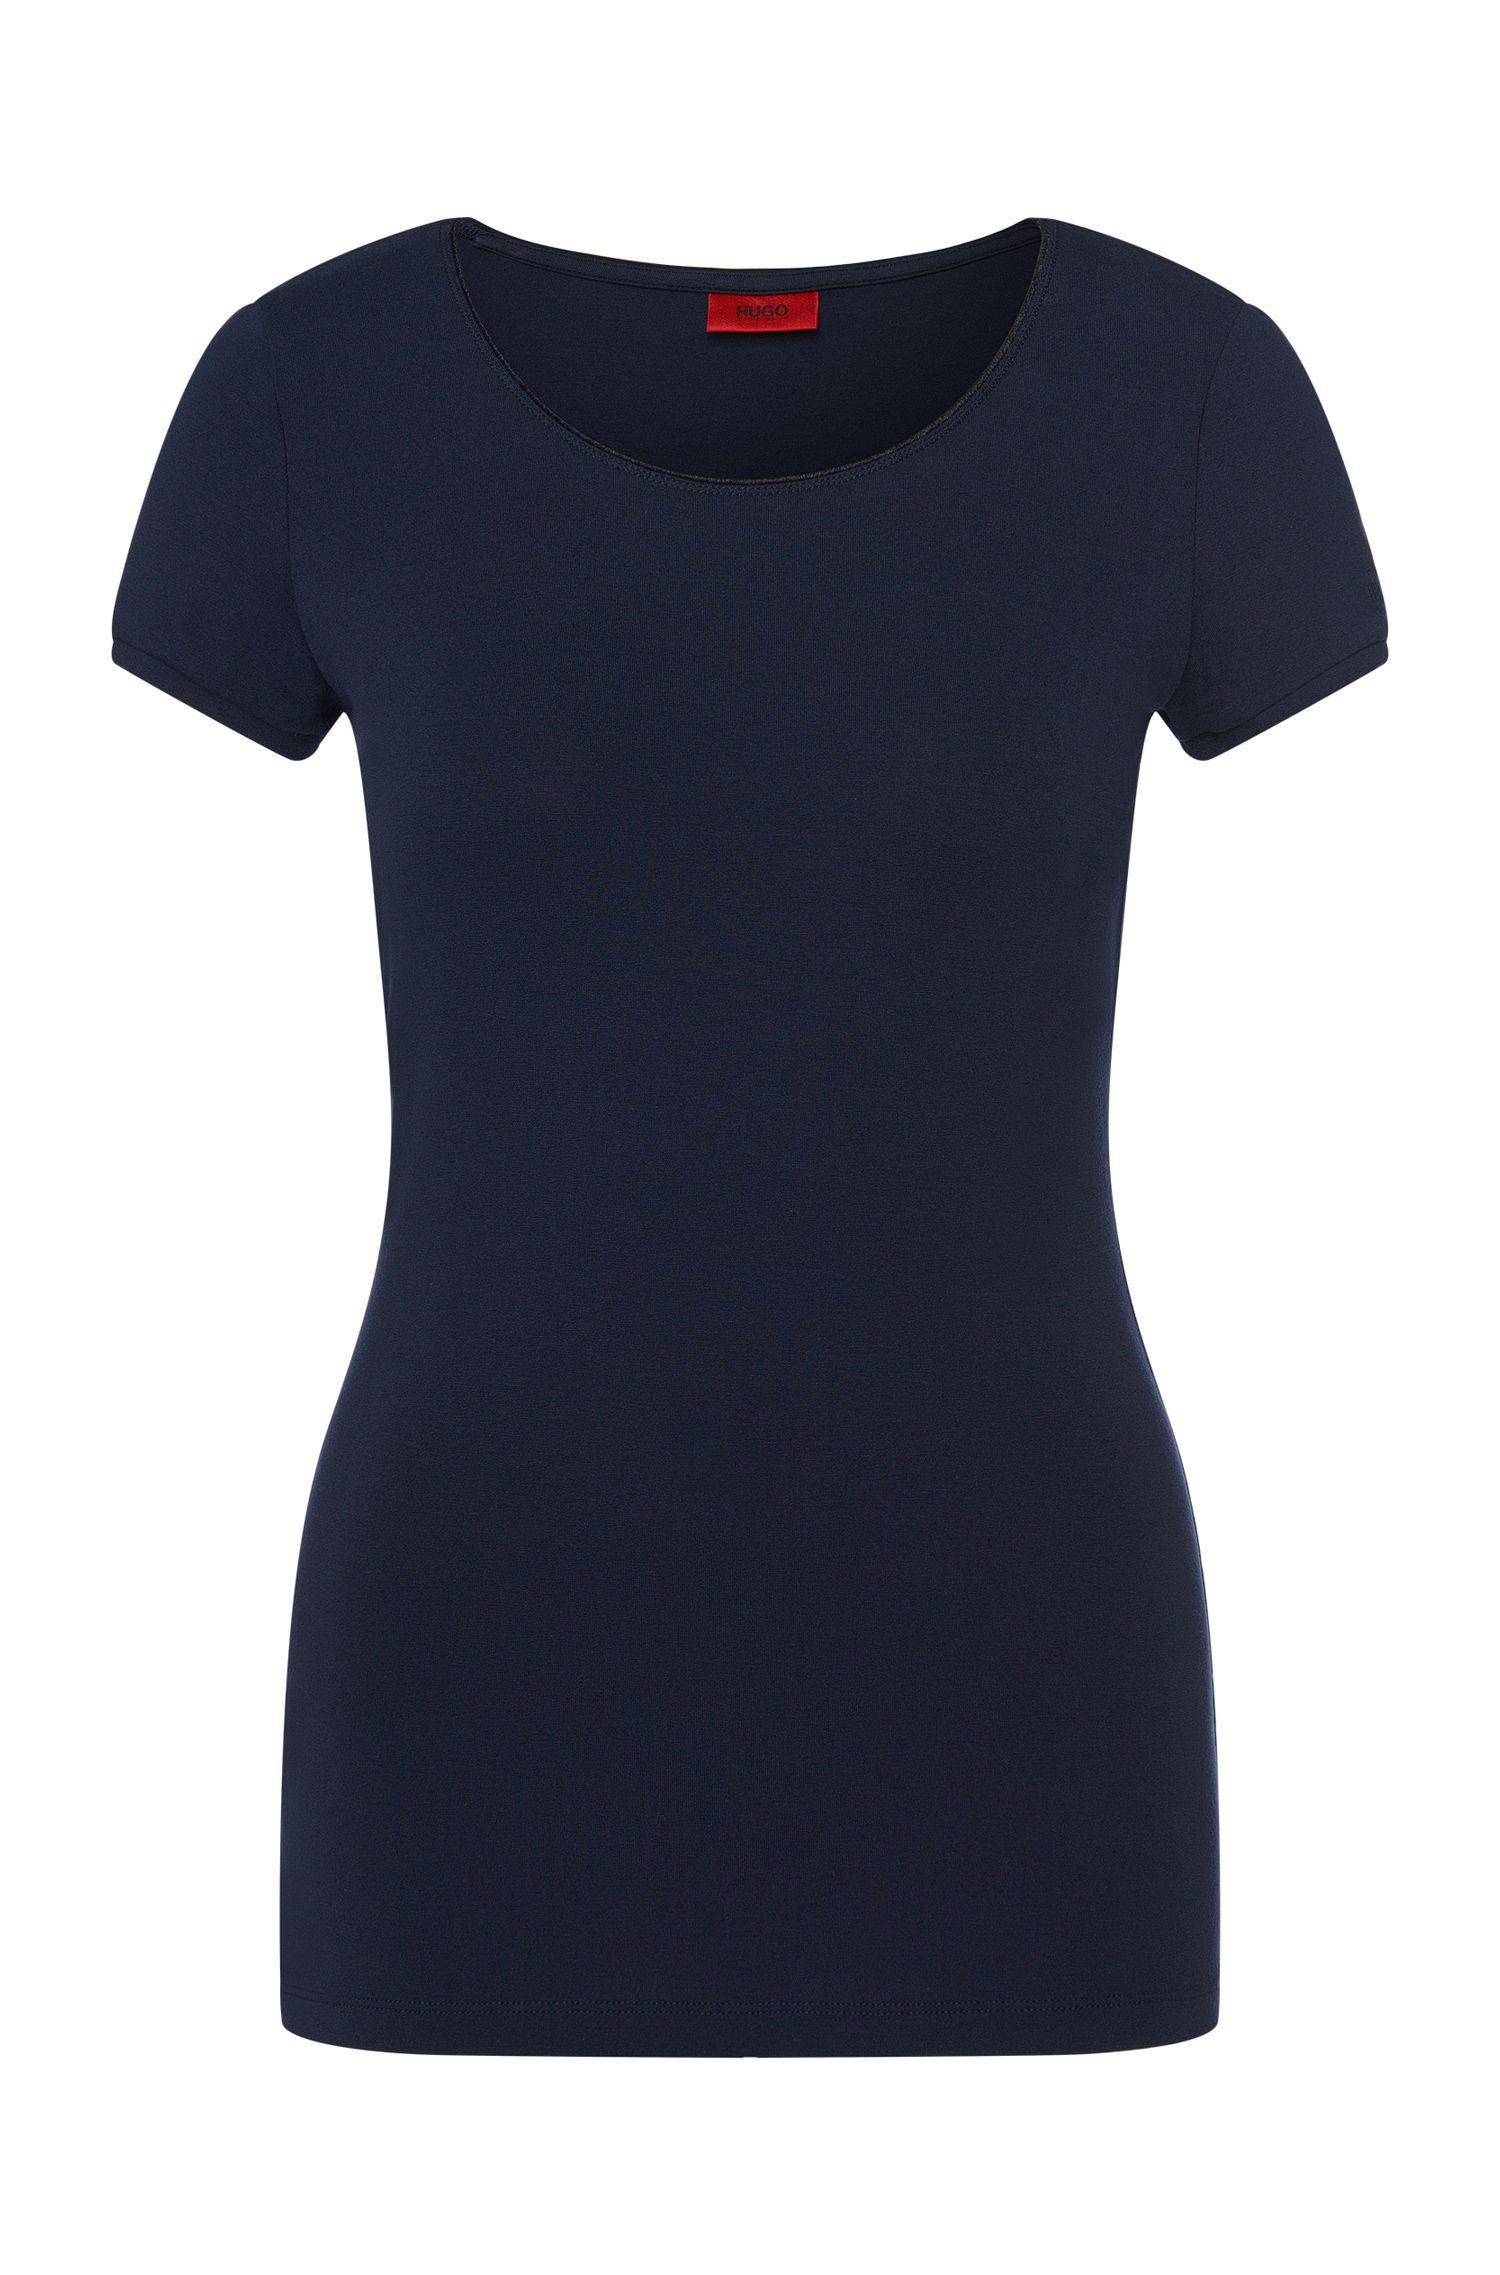 Unifarbenes T-Shirt aus Stretch-Viskose: 'Dabena'